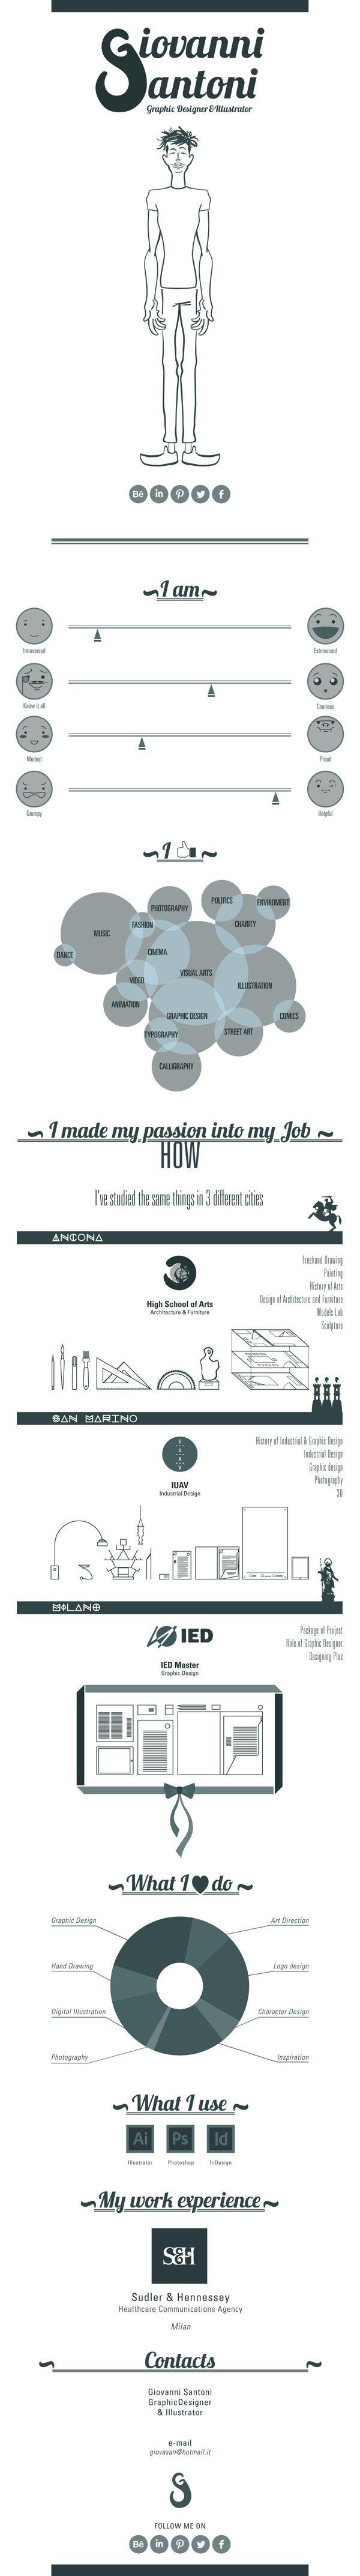 48 Best Interesting Visual Resumes Images On Pinterest Resume